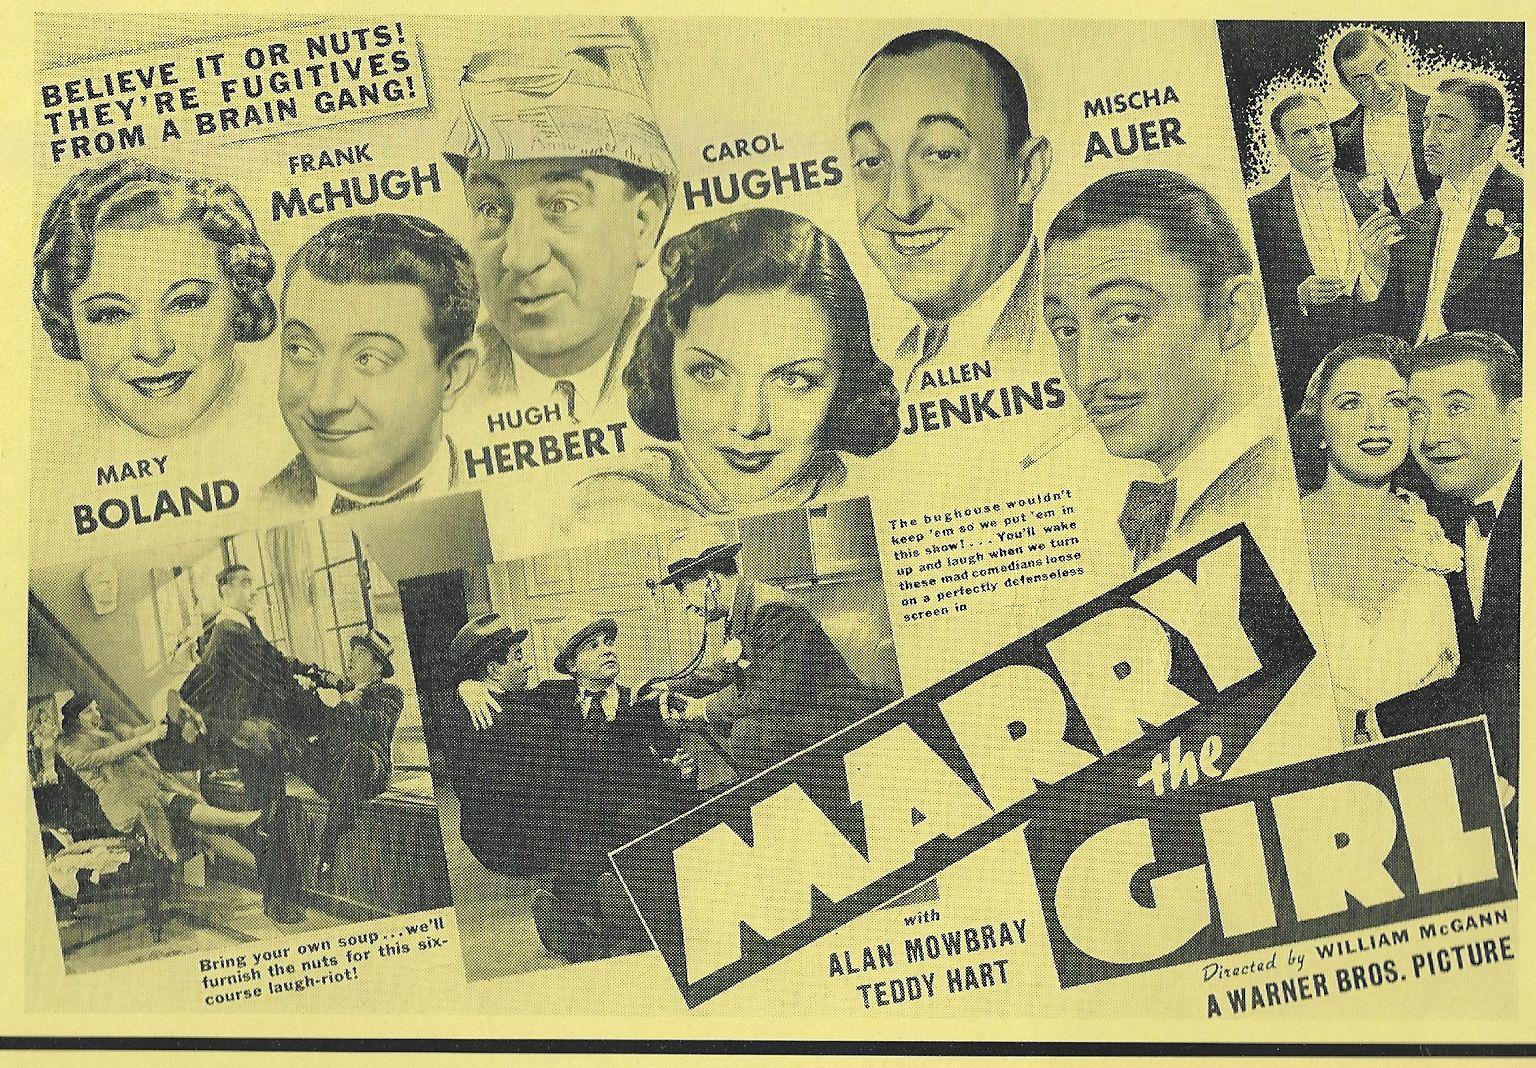 Hugh Herbert, Mischa Auer, Mary Boland, Teddy Hart, Carol Hughes, Allen Jenkins, Frank McHugh, and Alan Mowbray in Marry the Girl (1937)